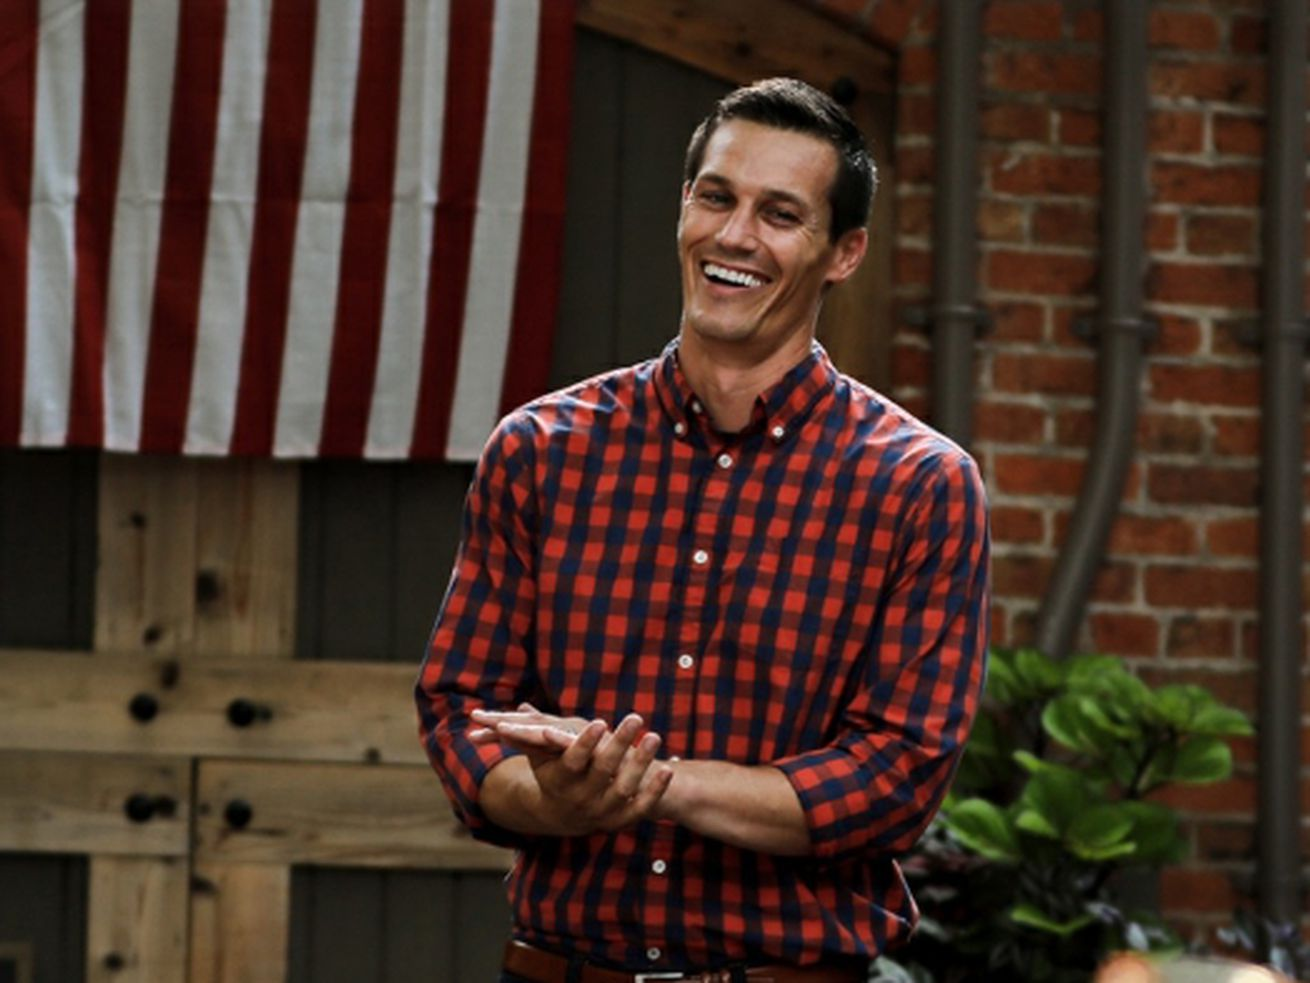 Republican candidate for governor Jesse Sullivan